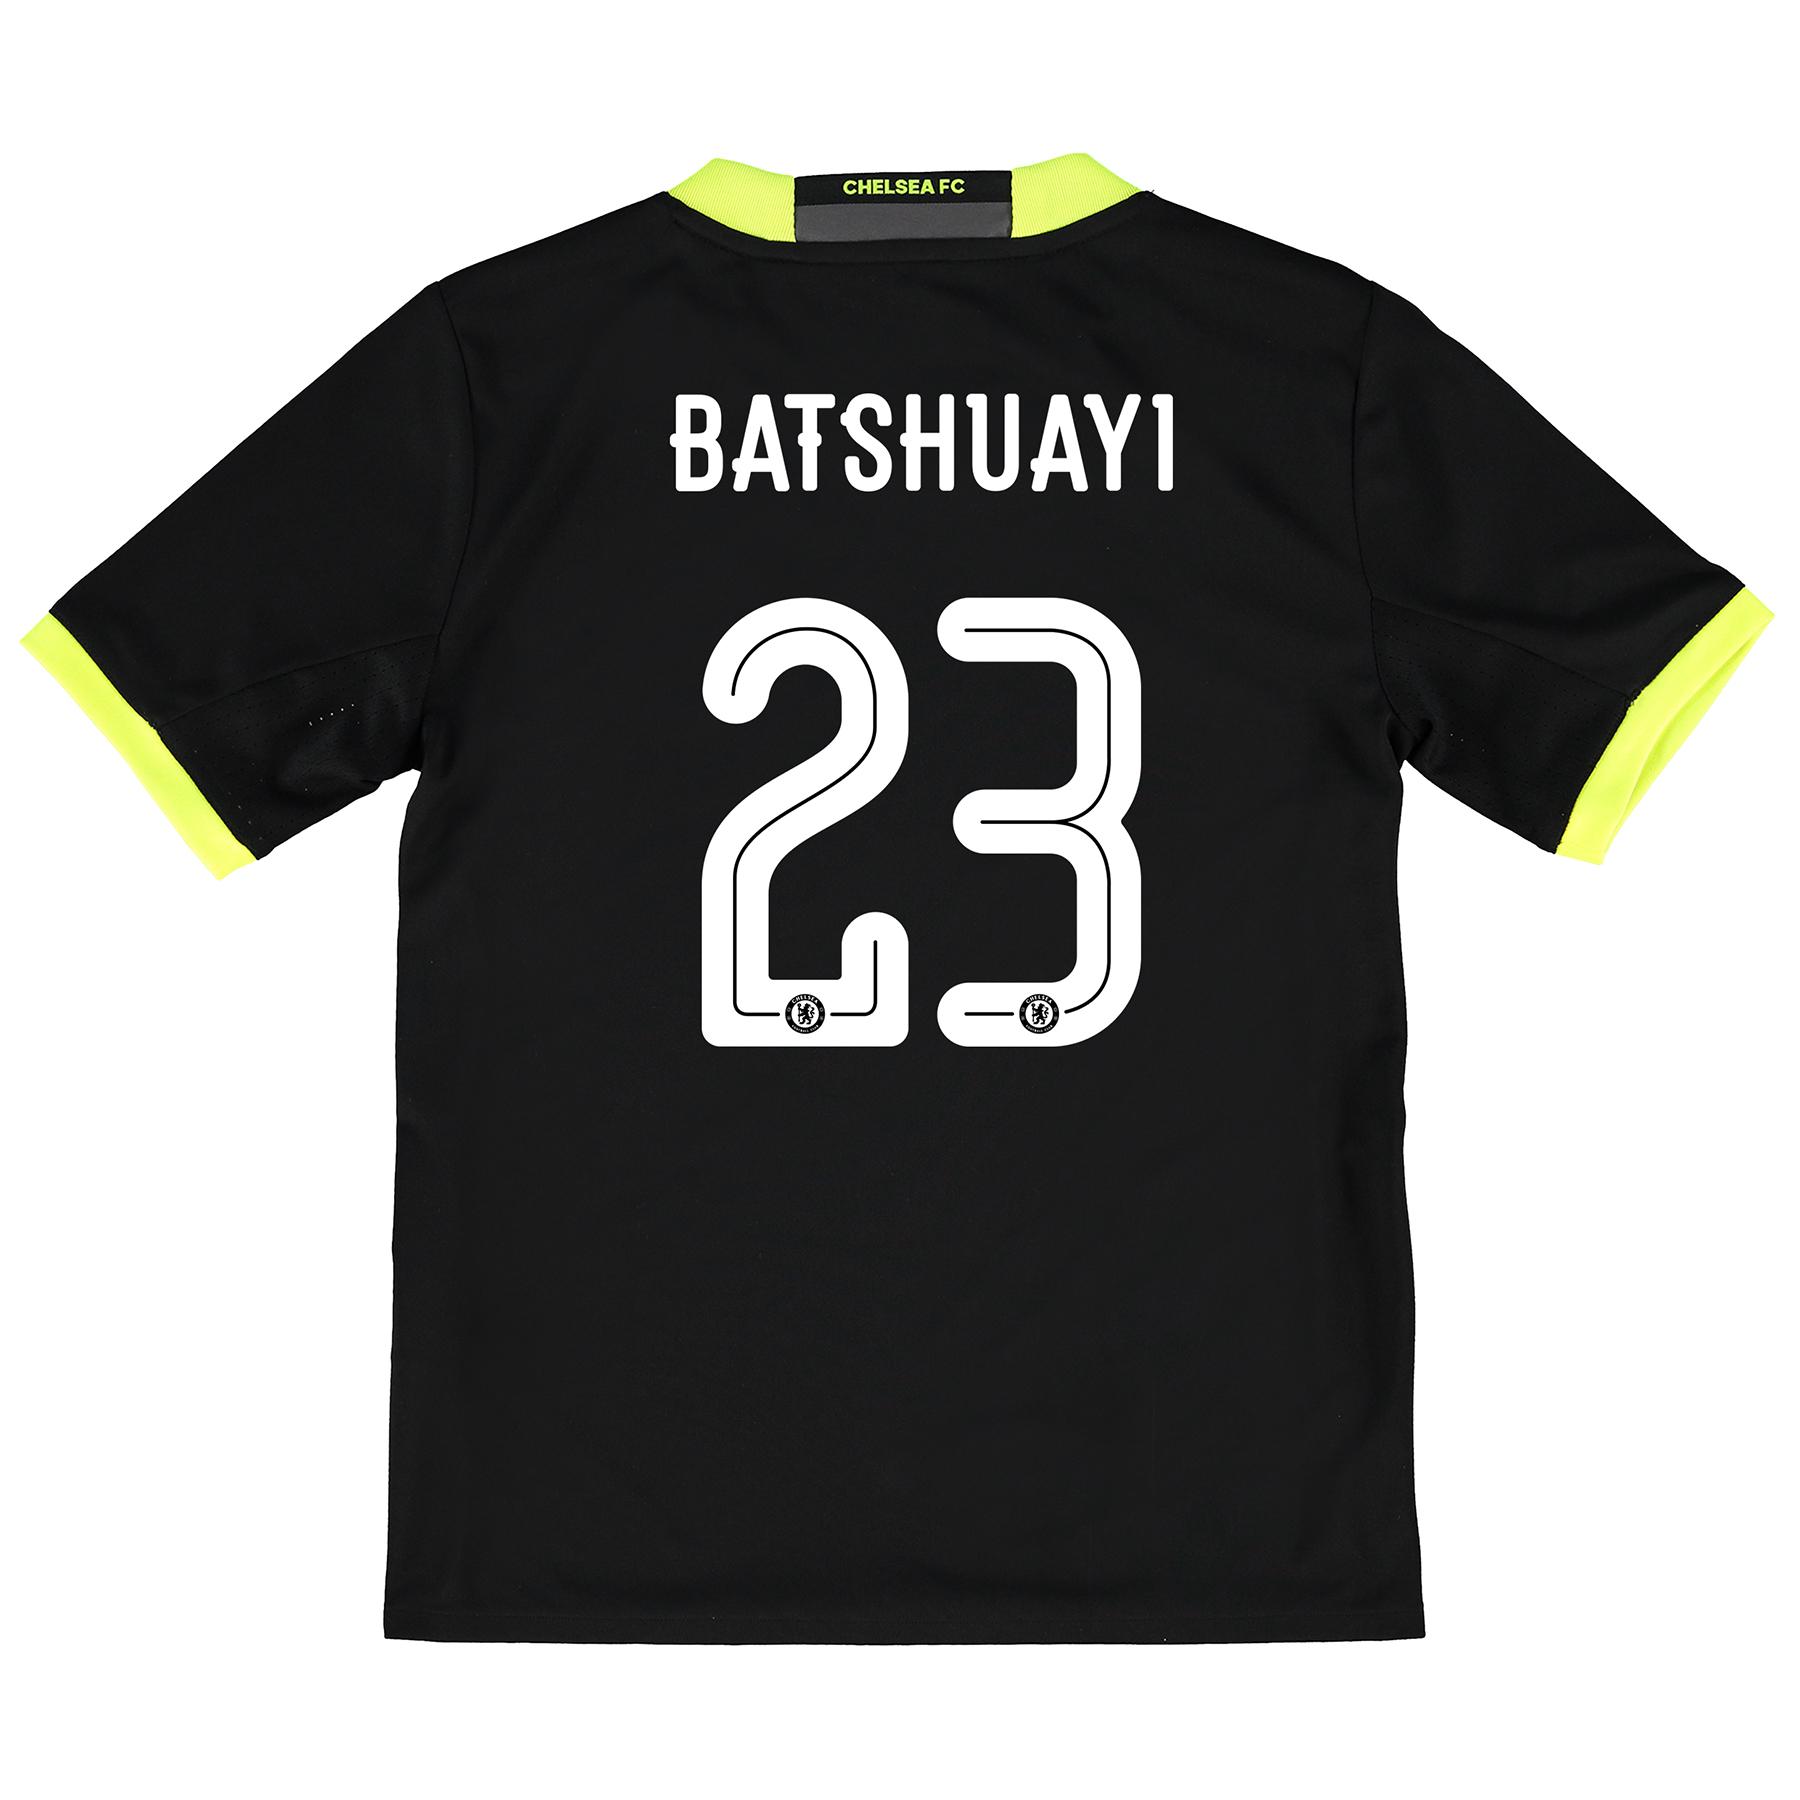 Chelsea Linear Away Shirt 16-17 - Kids with Batshuayi 23 printing